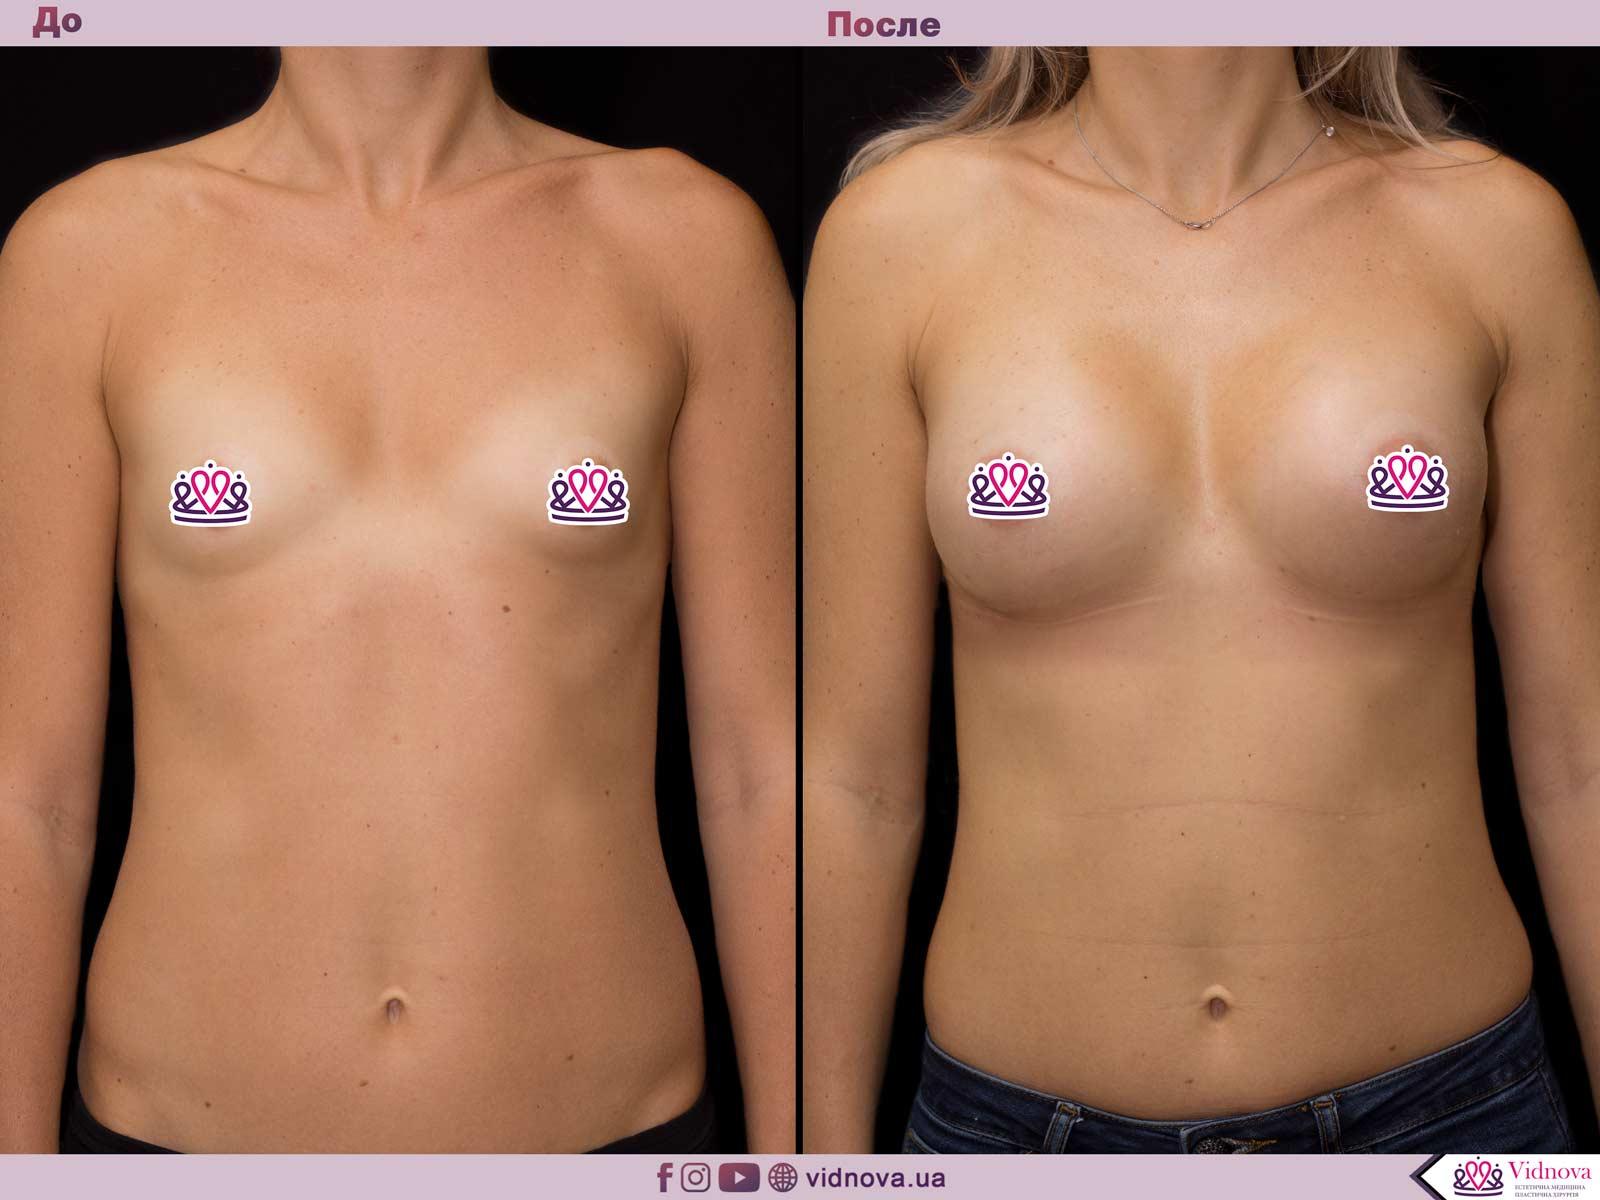 Увеличение груди: Фото ДО и ПОСЛЕ - Пример №46-1 - Клиника Vidnova